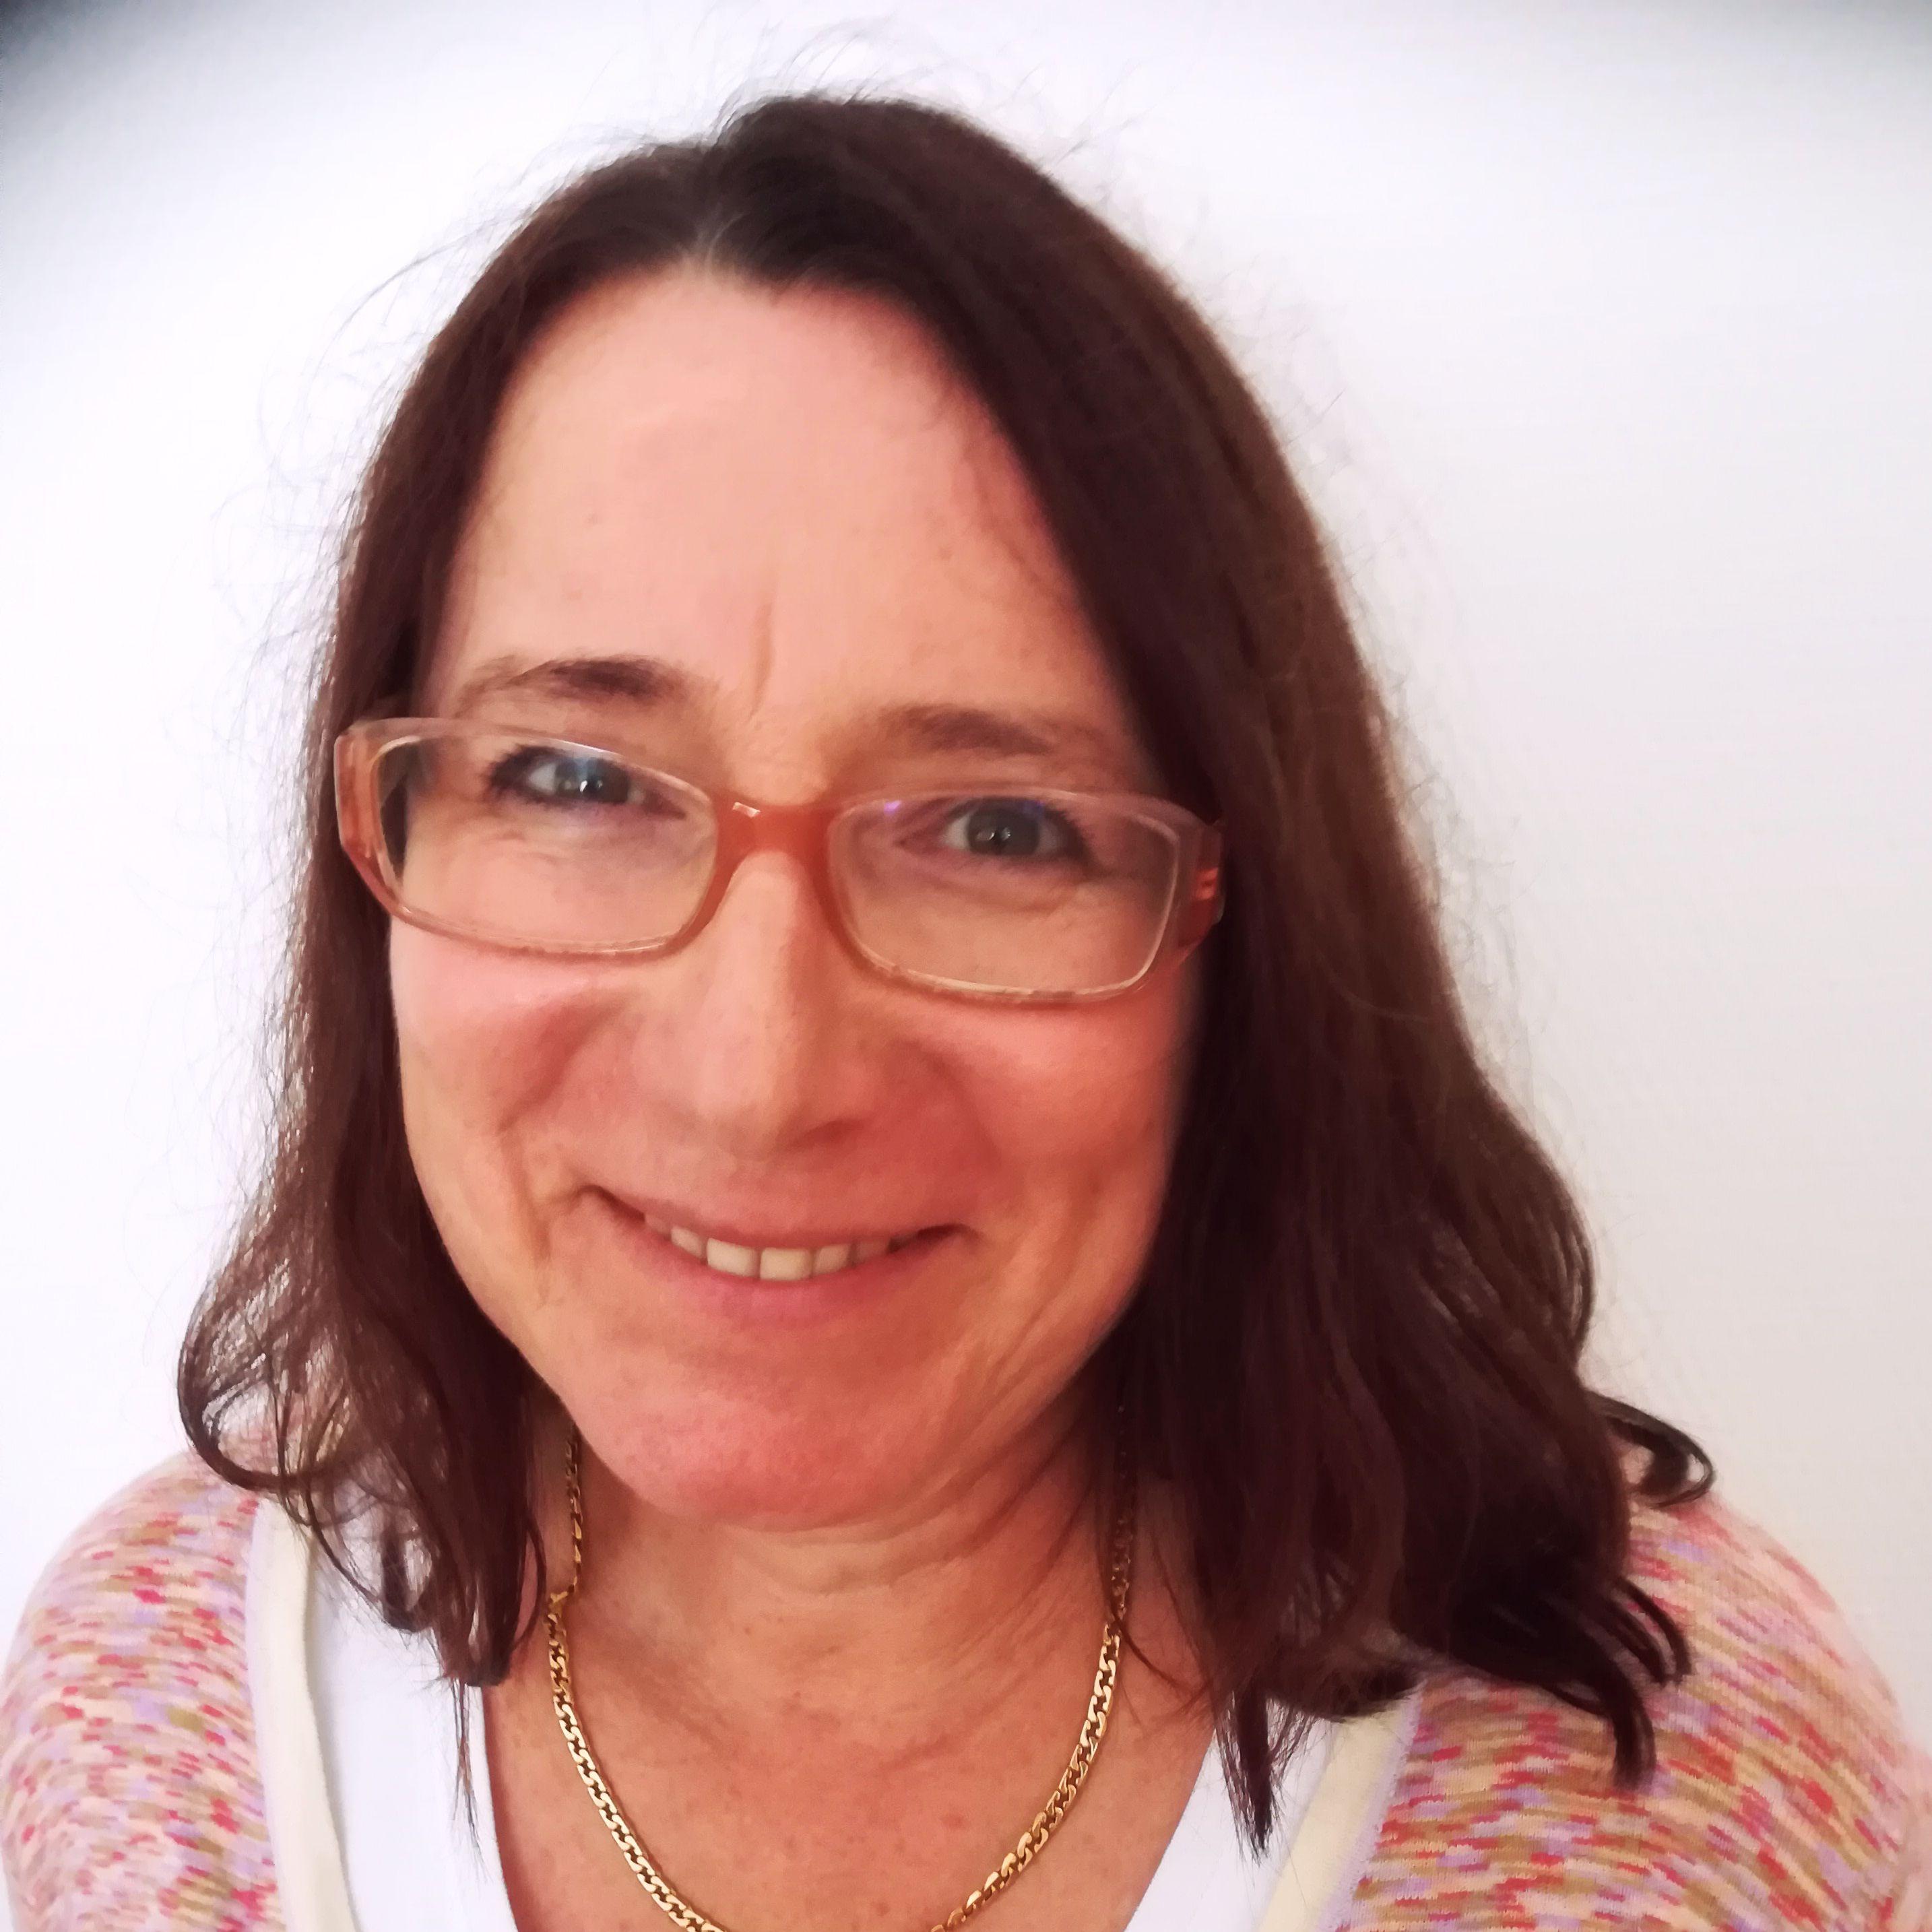 Sabine Pfeifer